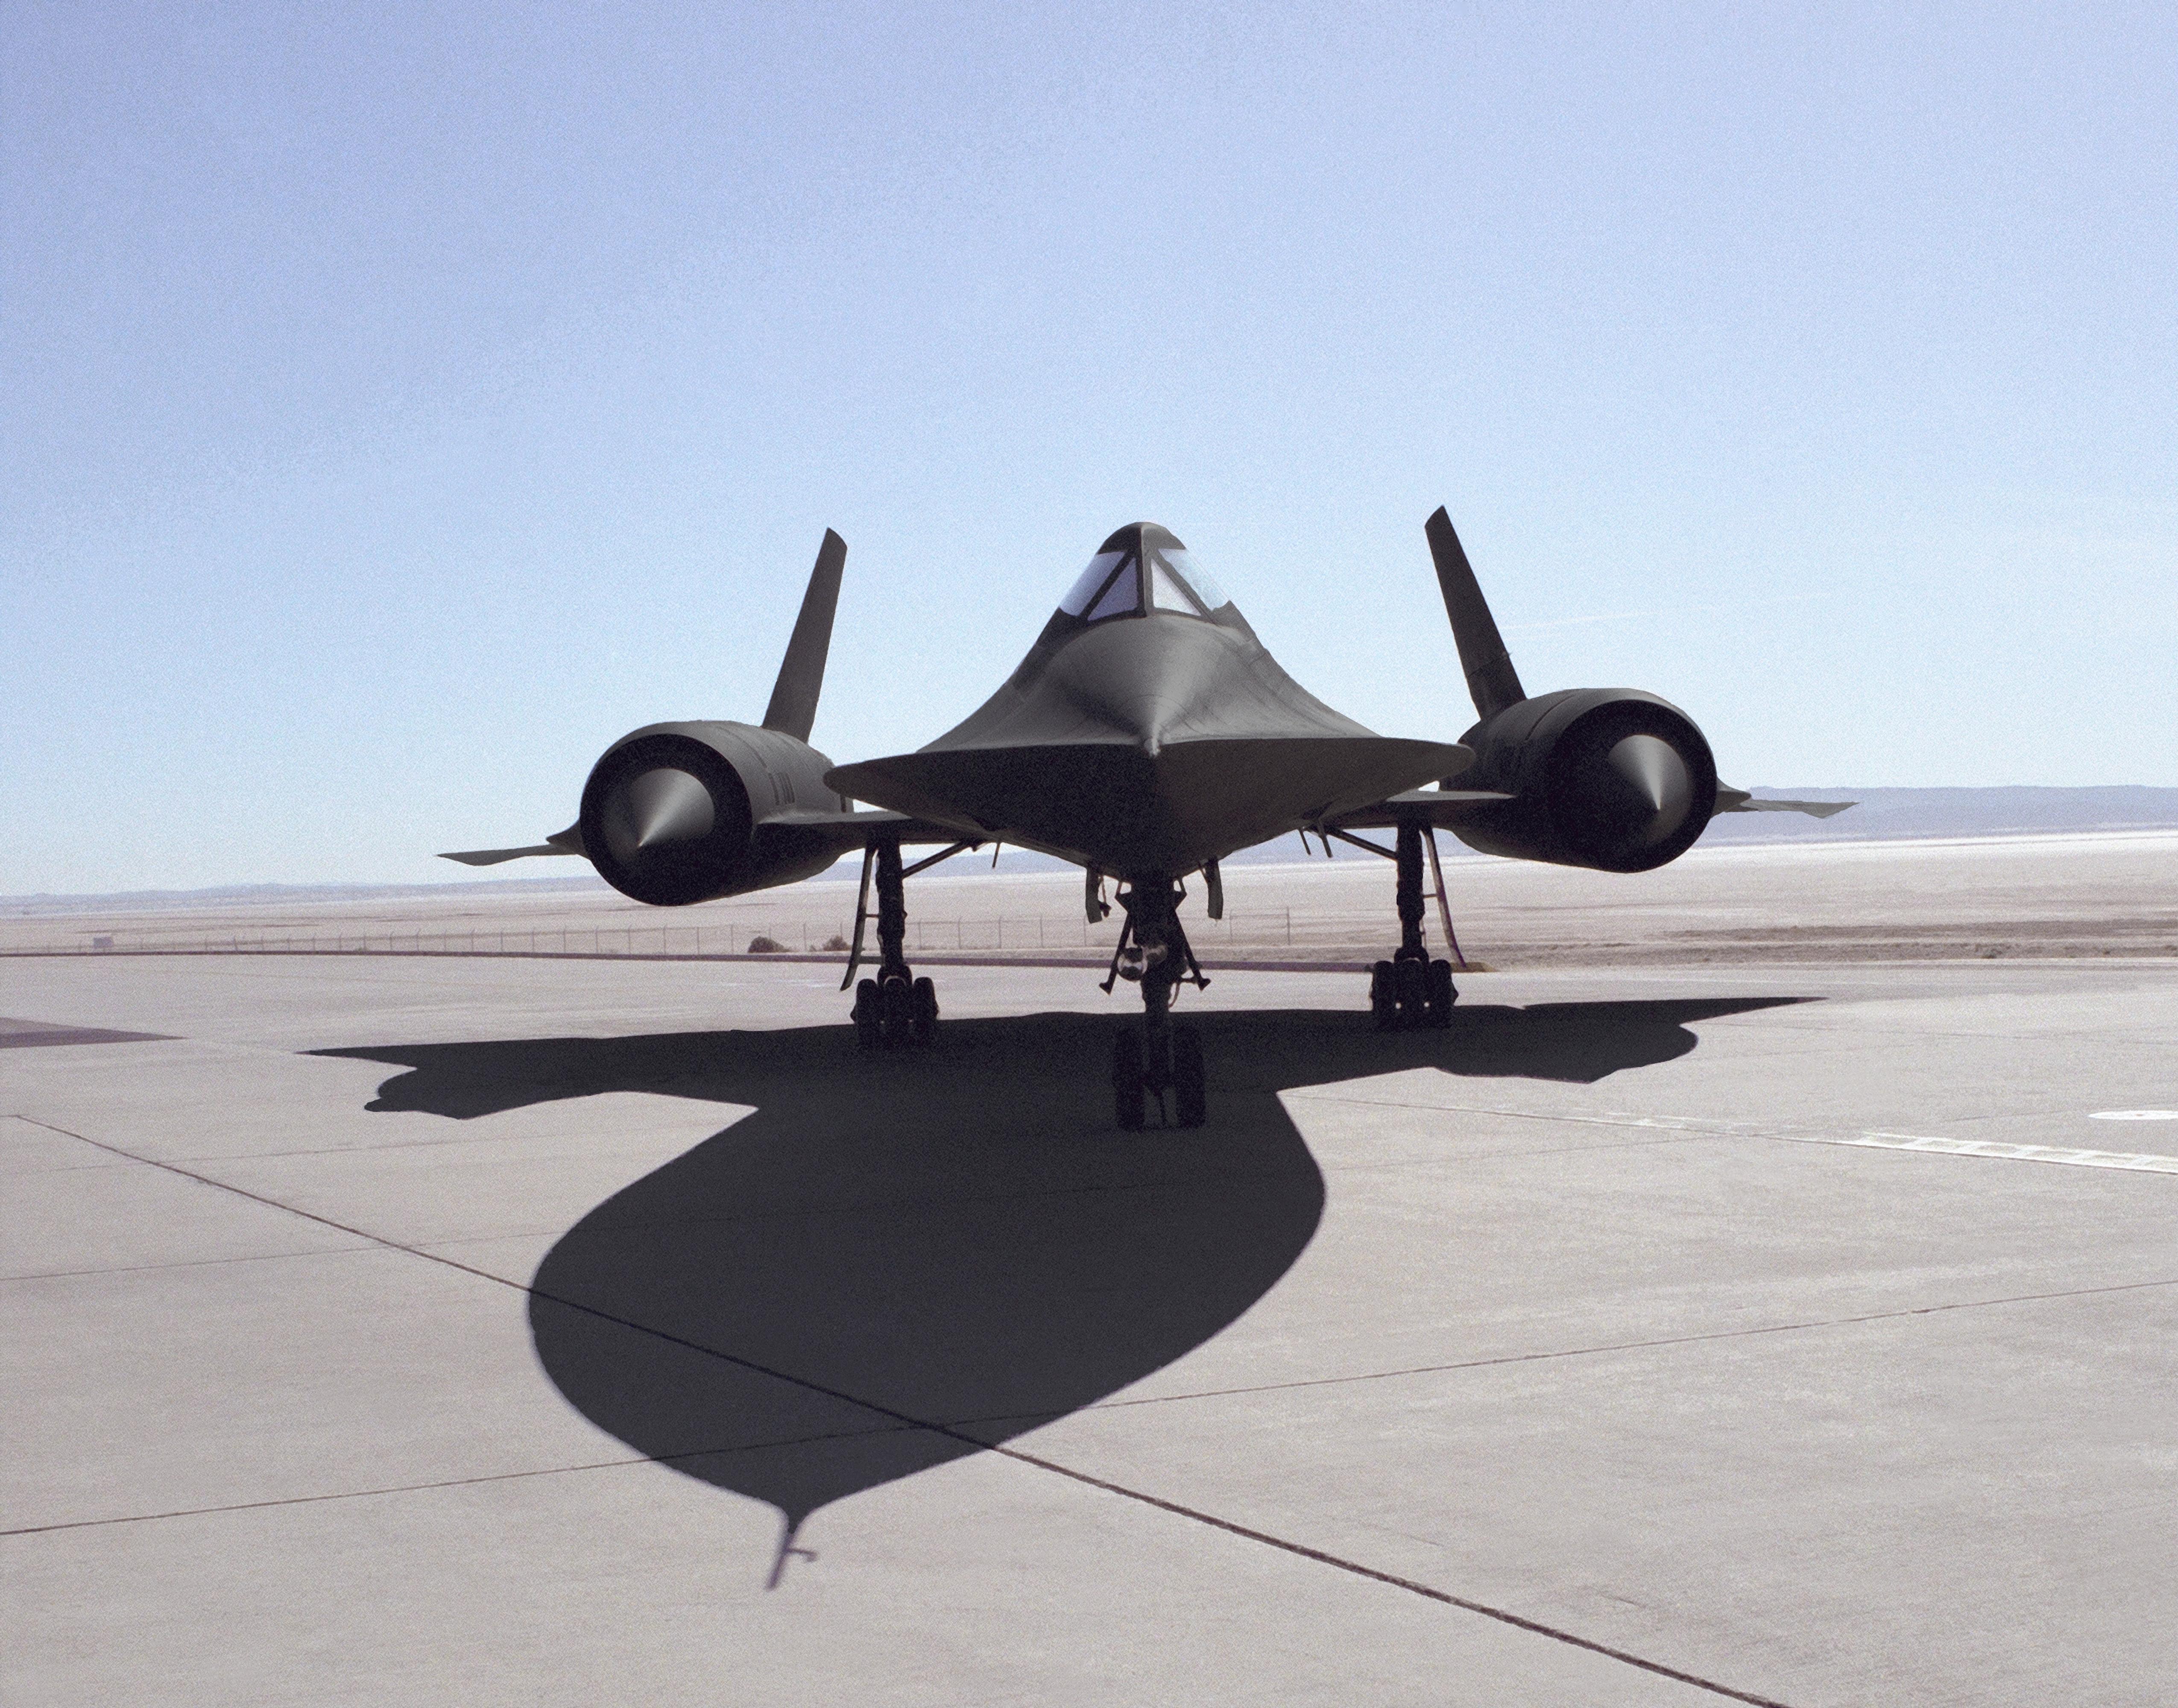 United States Air Force USAF Lockheed SR-71 Blackbird Military ...